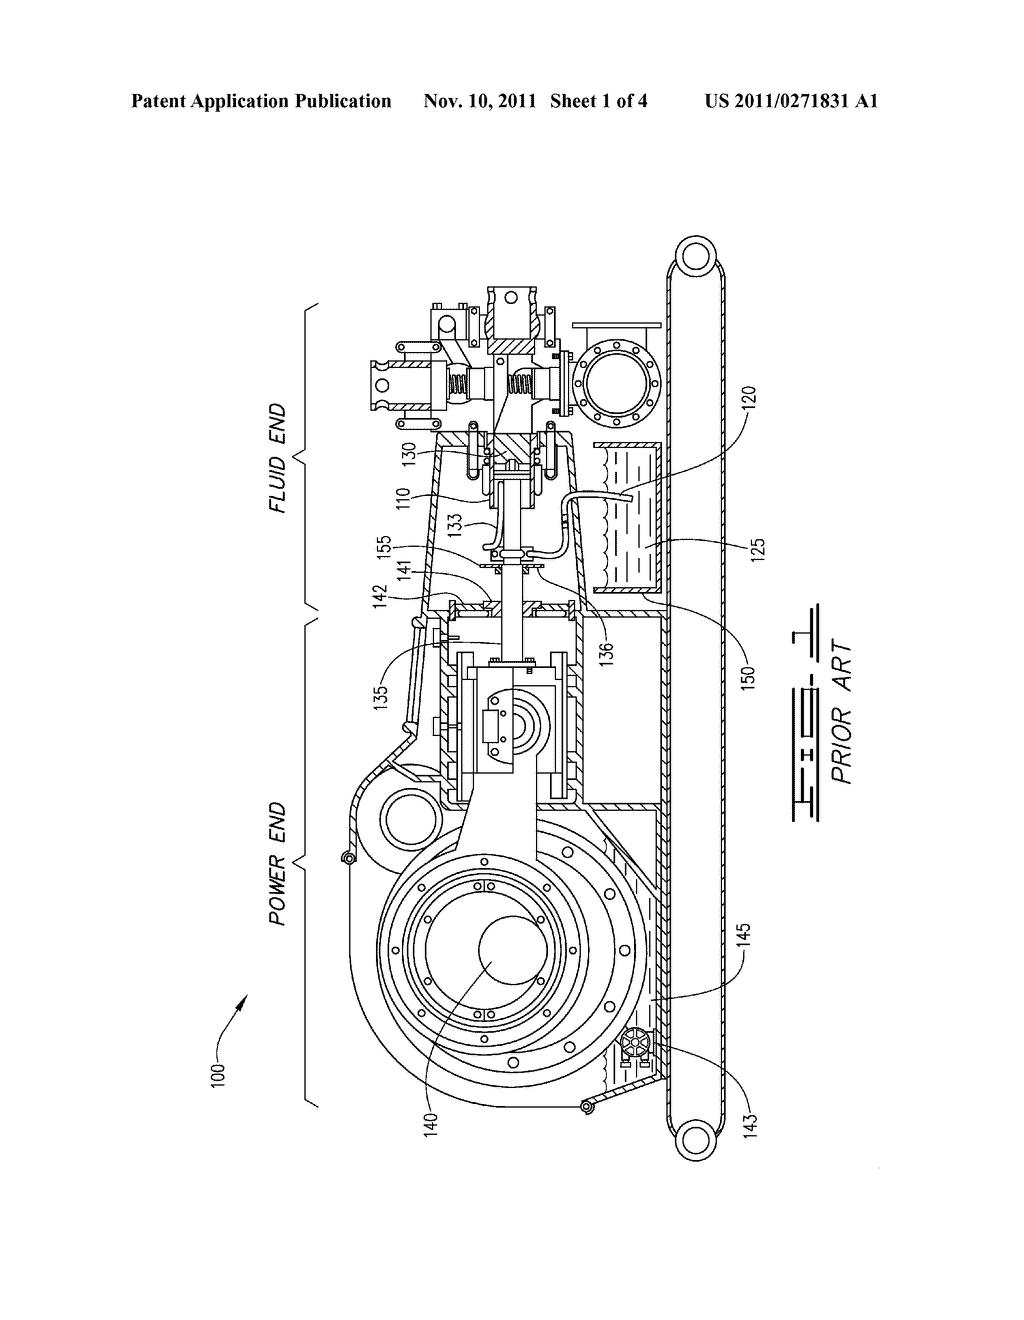 oilfield wiring diagrams g6 gtp blower wiring diagrams mud pump schematic - wiring diagram #8